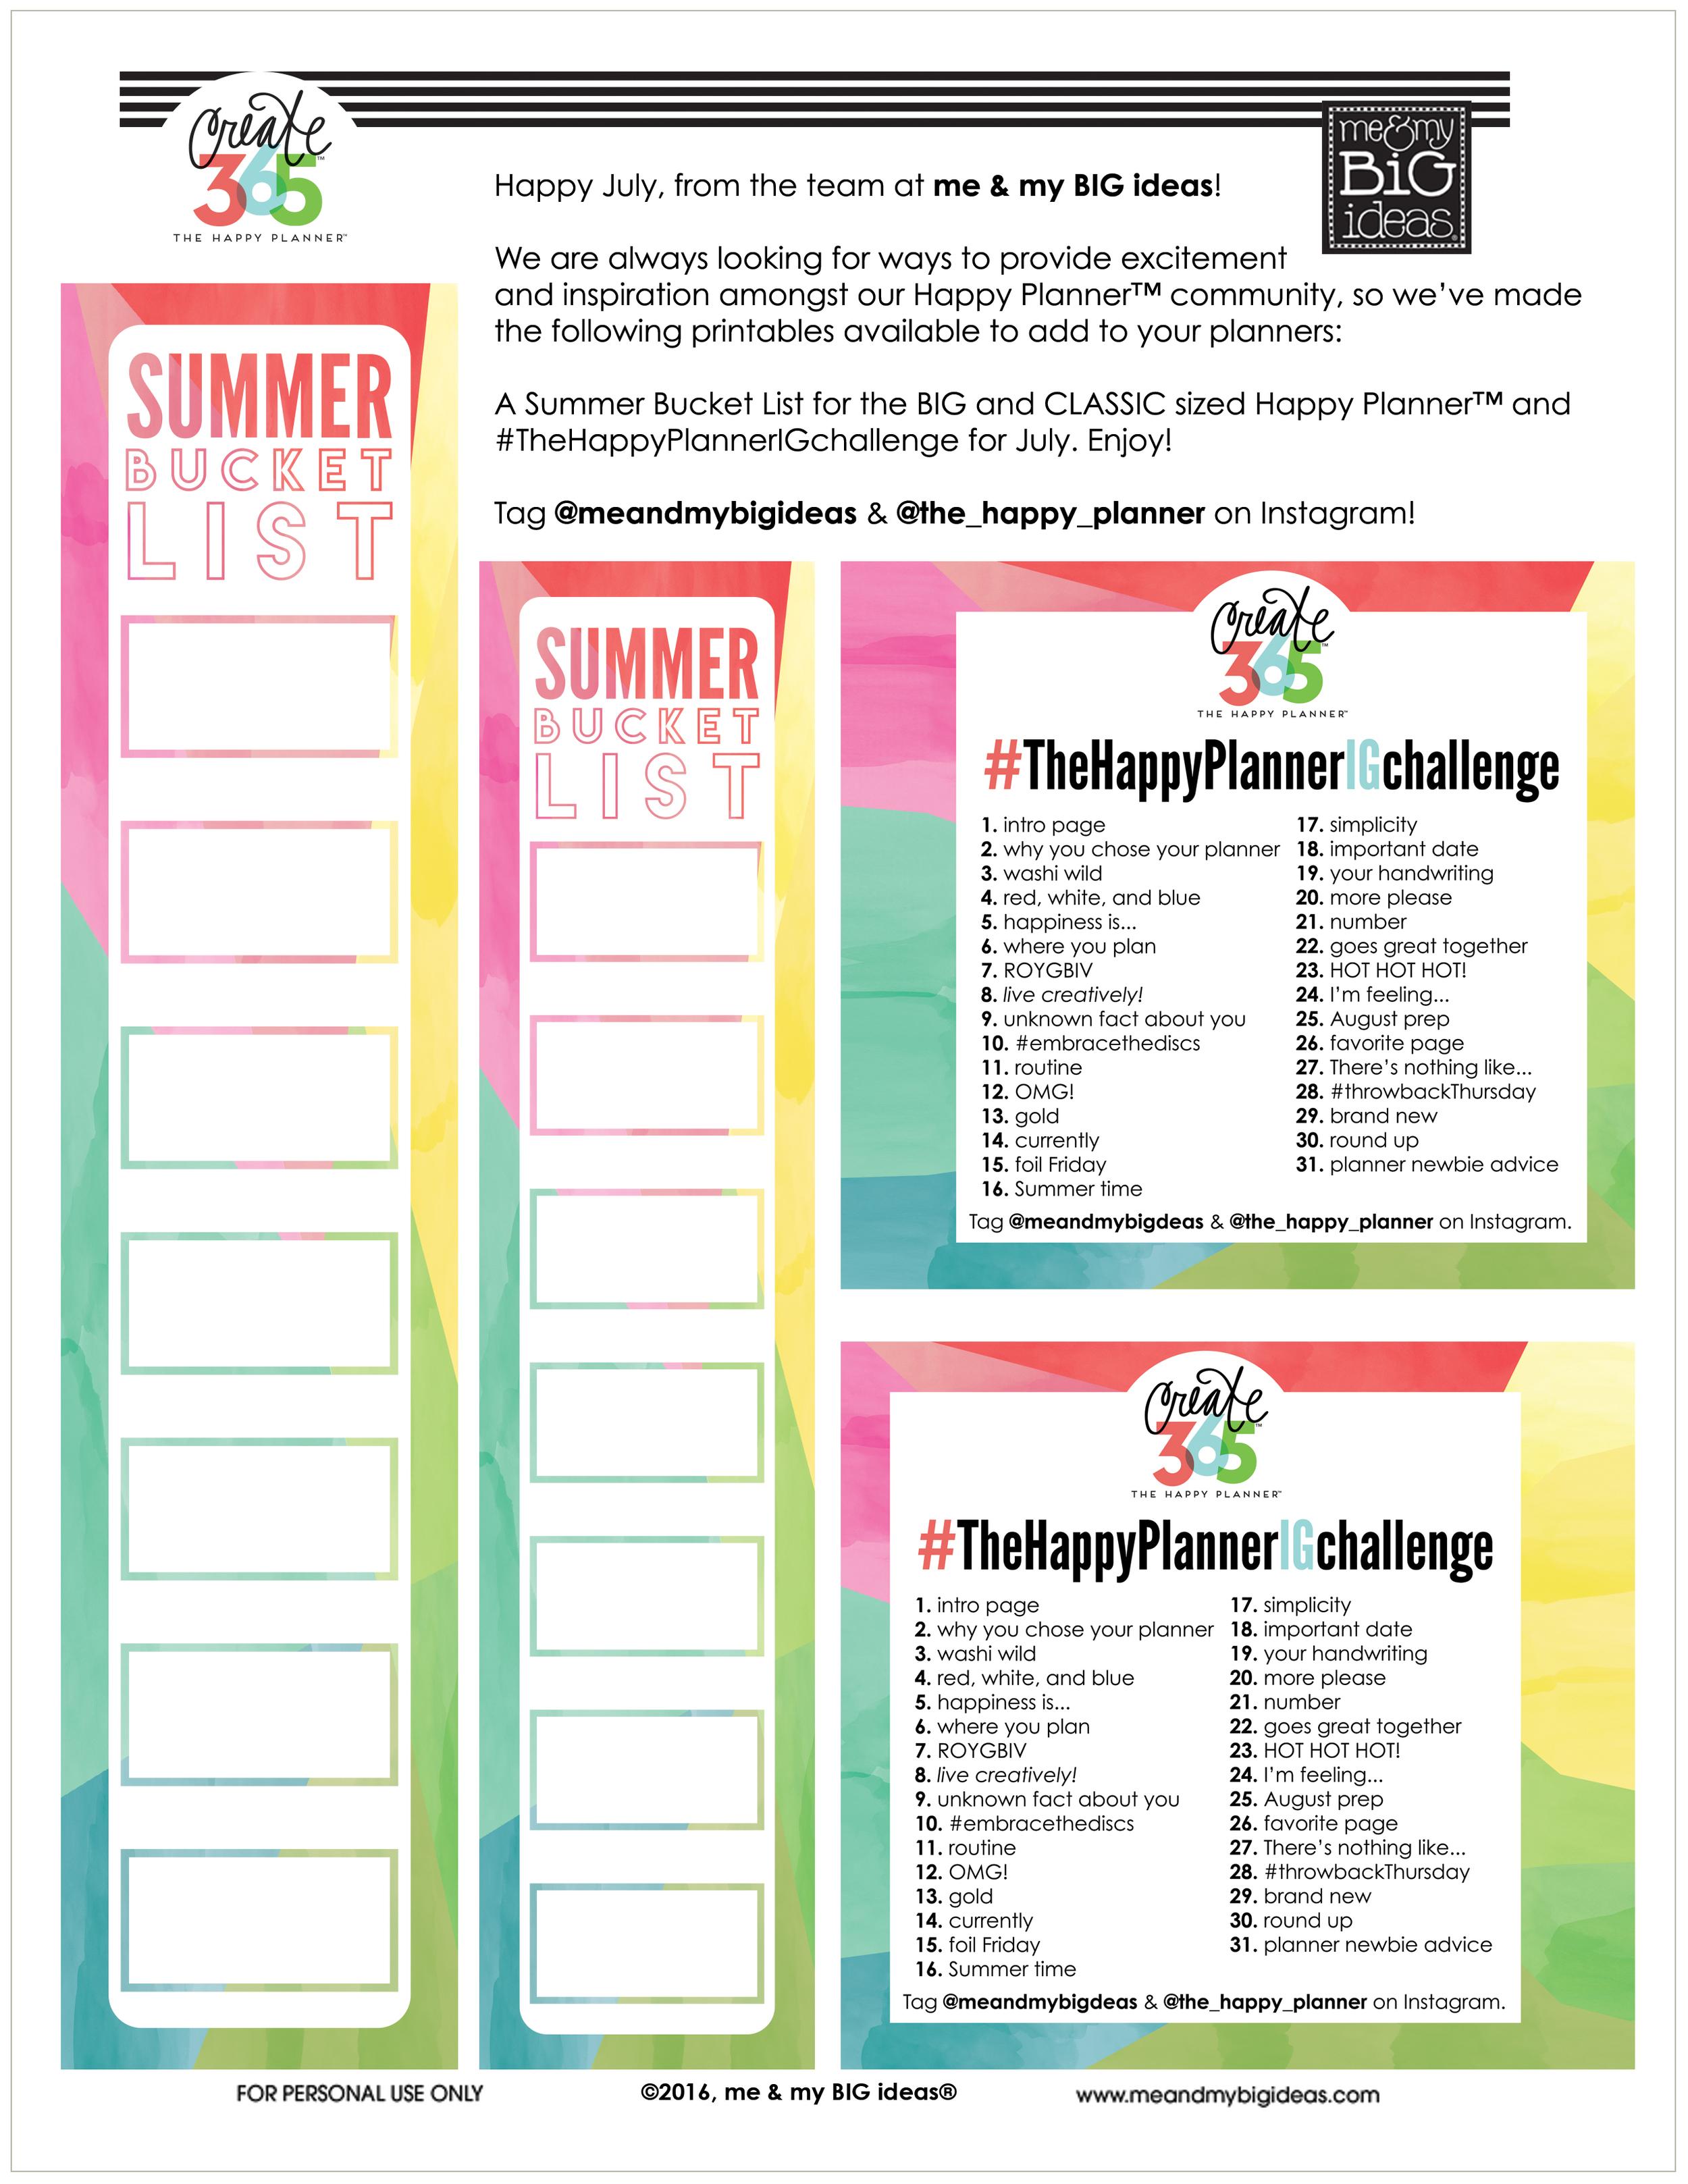 SUMMER BUCKET LIST & July 2016 IG challenge printable.jpg